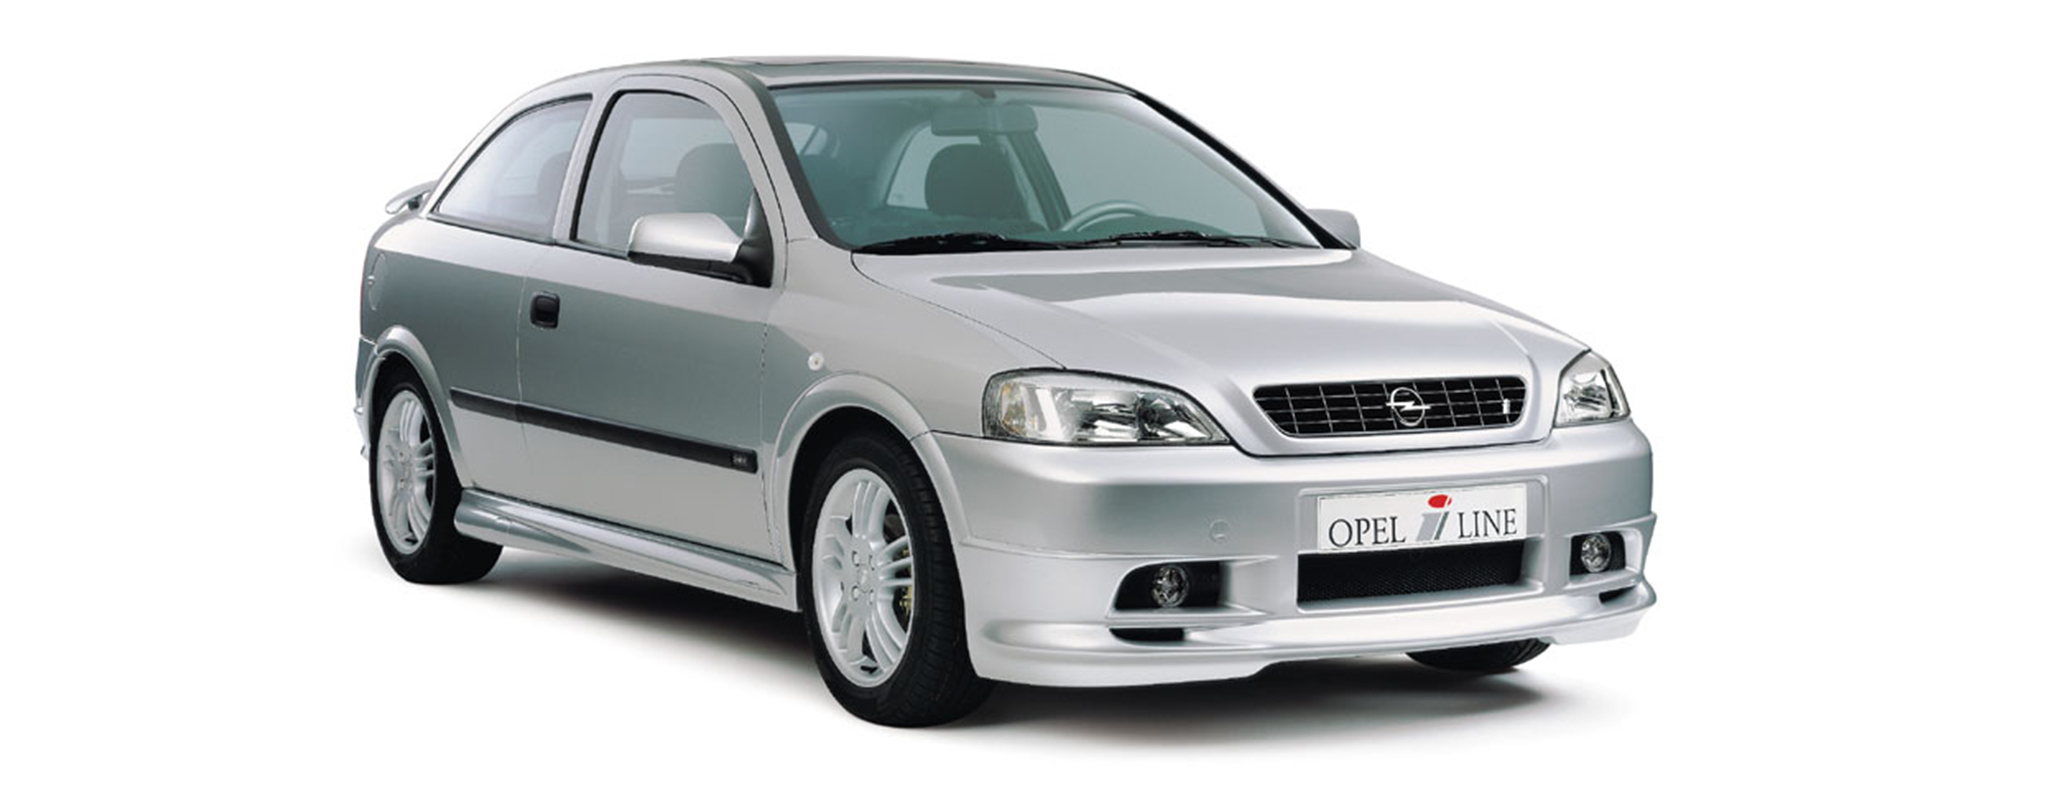 Viva Kia New Toyota Aygo 3 Door Hatchback Car Configurator And The Perodua Axia Has Arrived